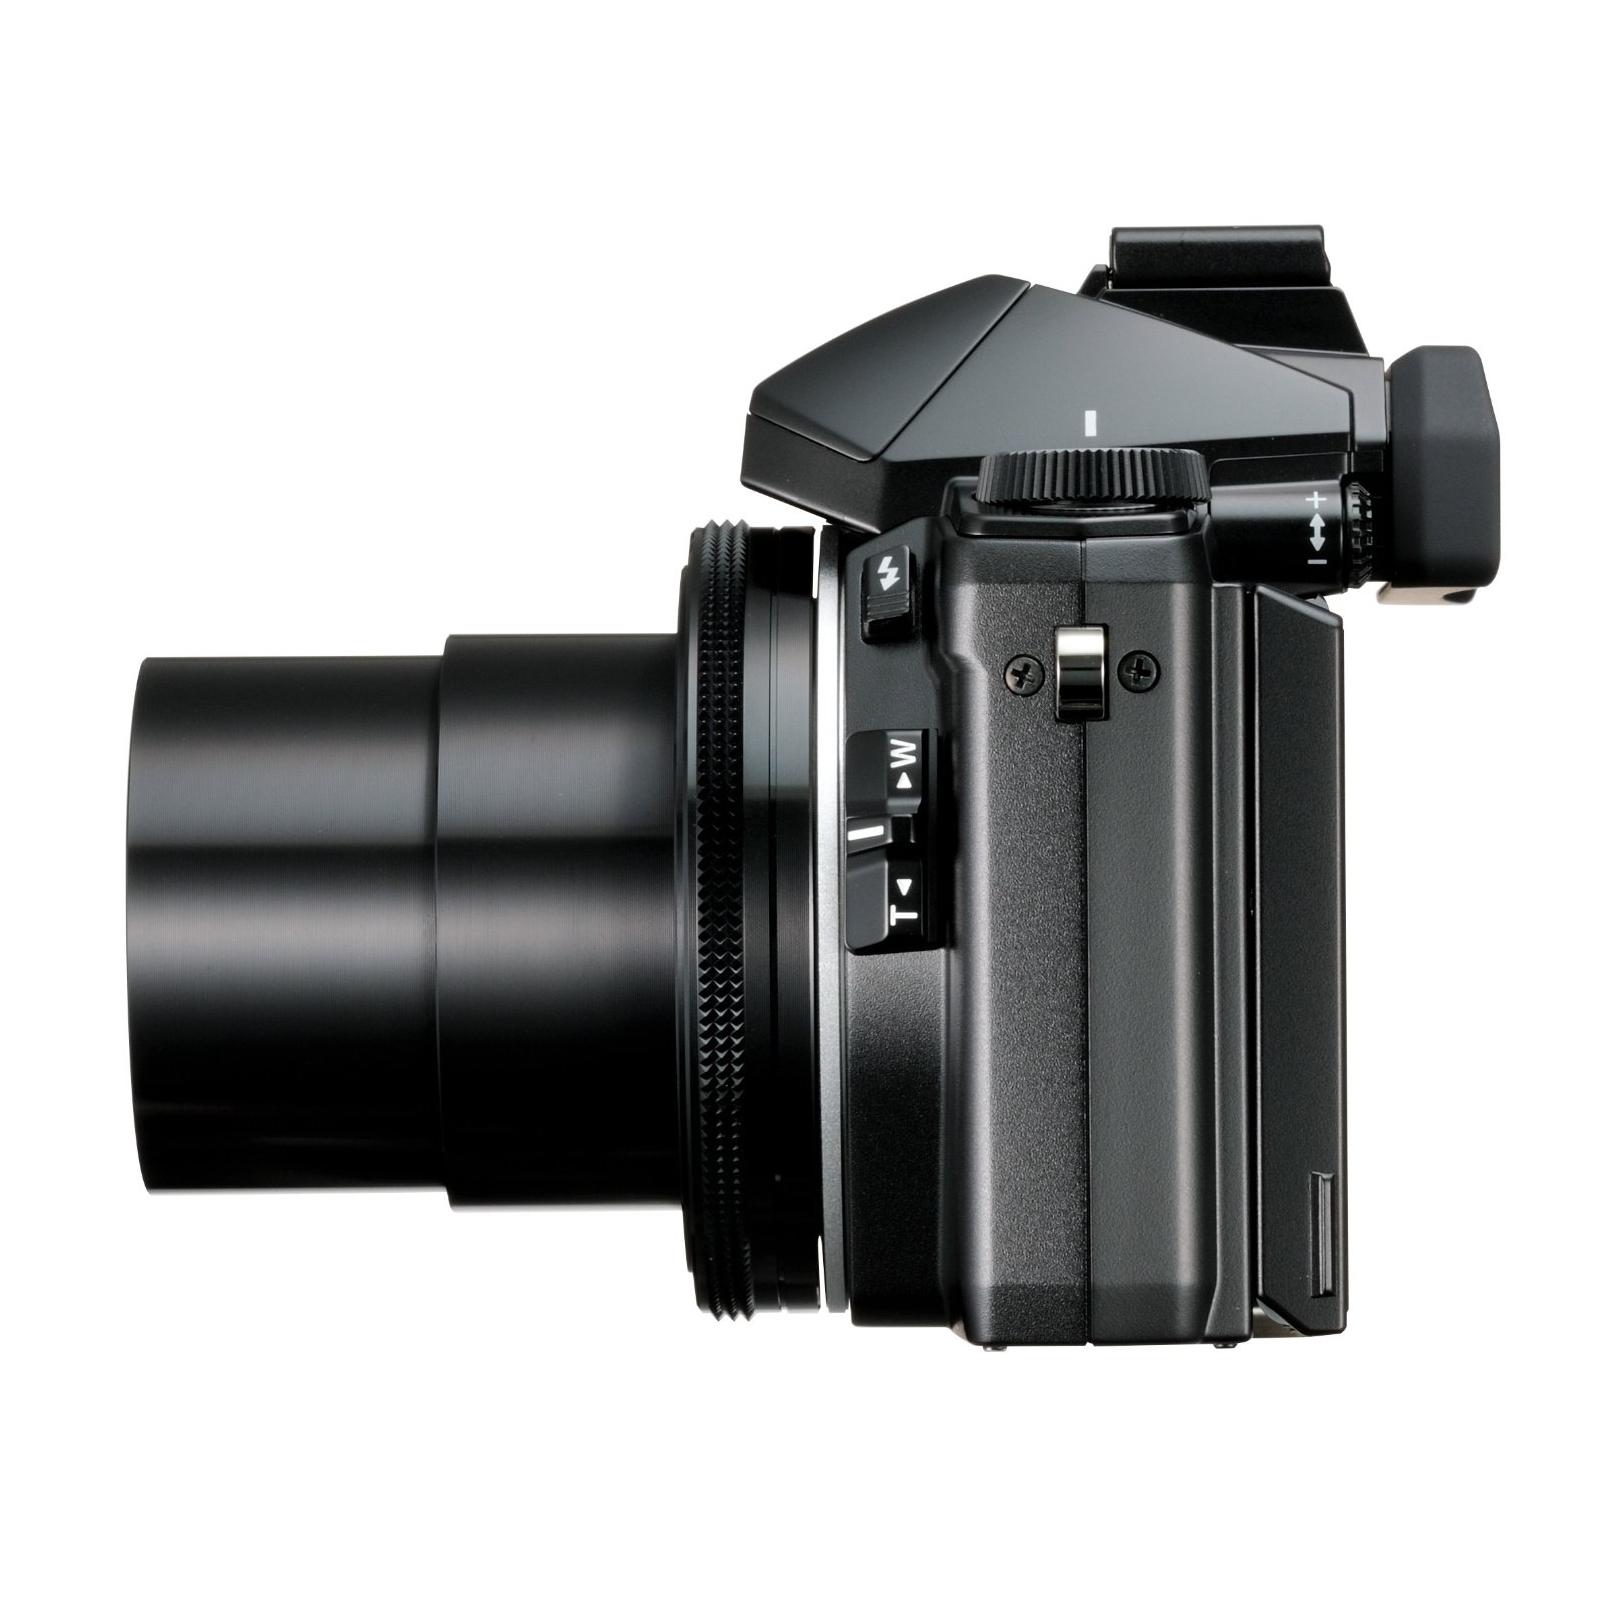 Цифровой фотоаппарат OLYMPUS STYLUS 1 Black (V109010BE000) изображение 9